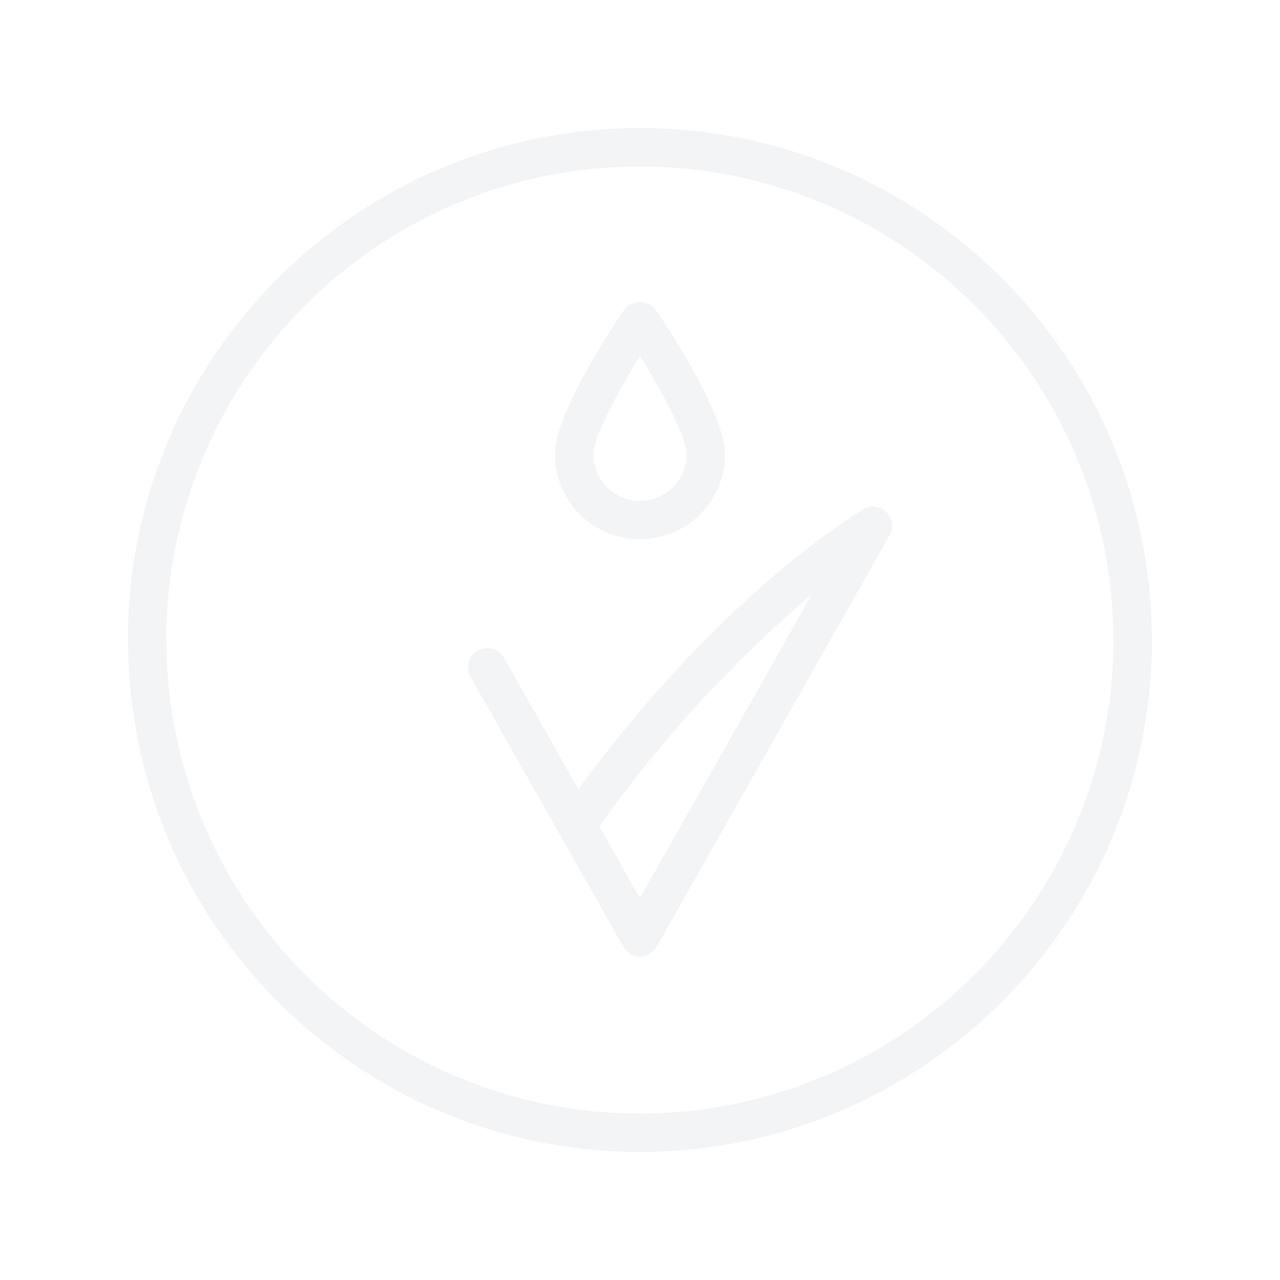 DR IRENA ERIS Aquality Hyper-Hydrating Recovery Cream 50ml